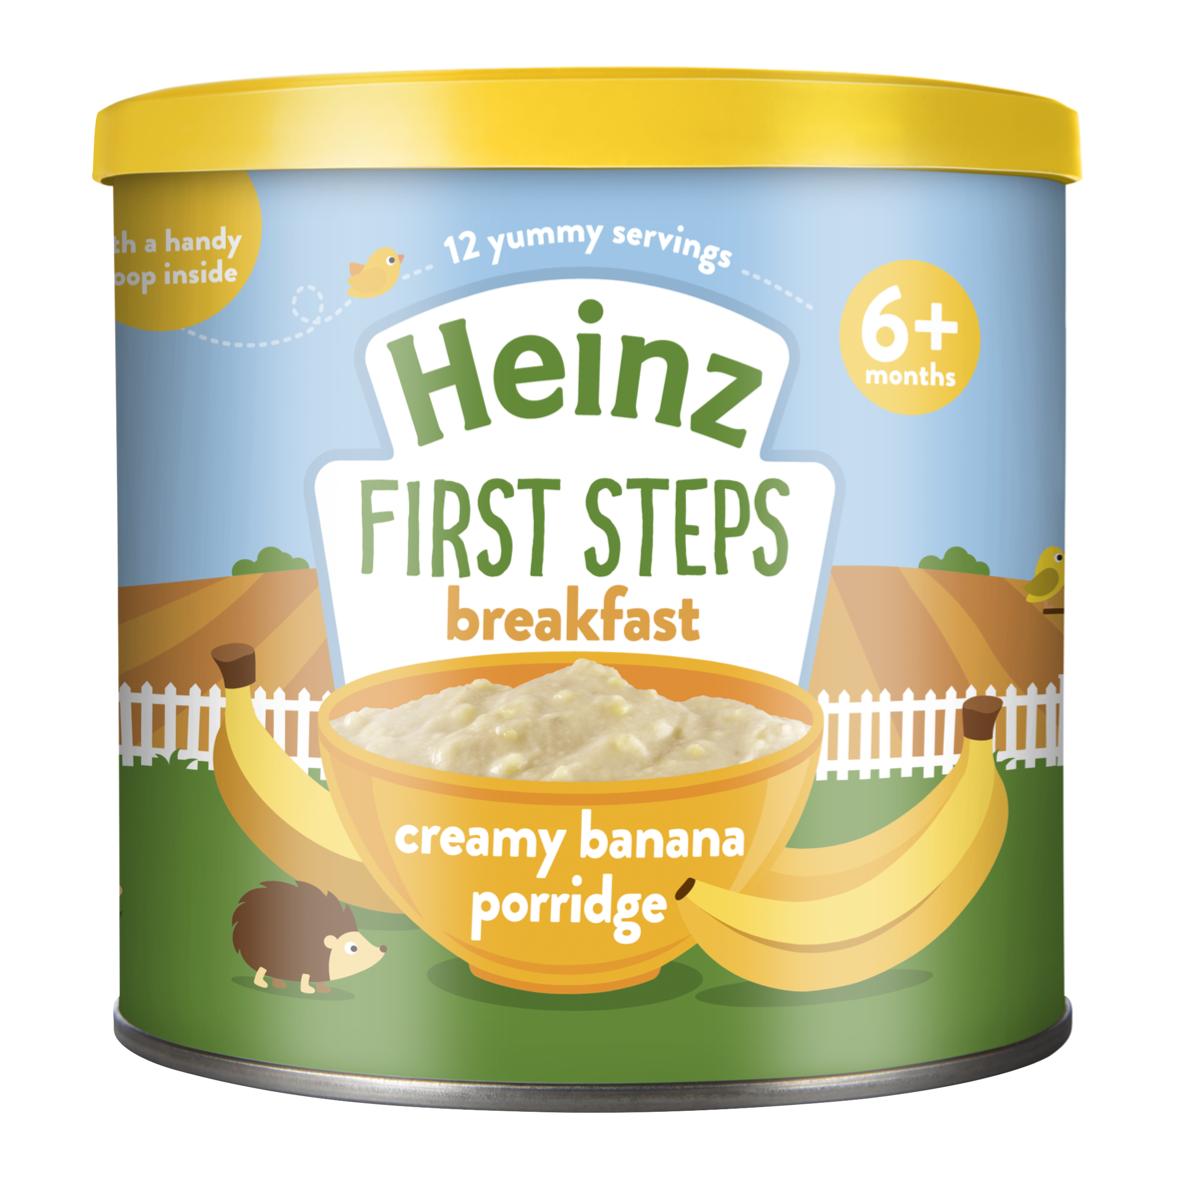 Photograph of 1x Heinz Creamy Banana Porridge 240g product